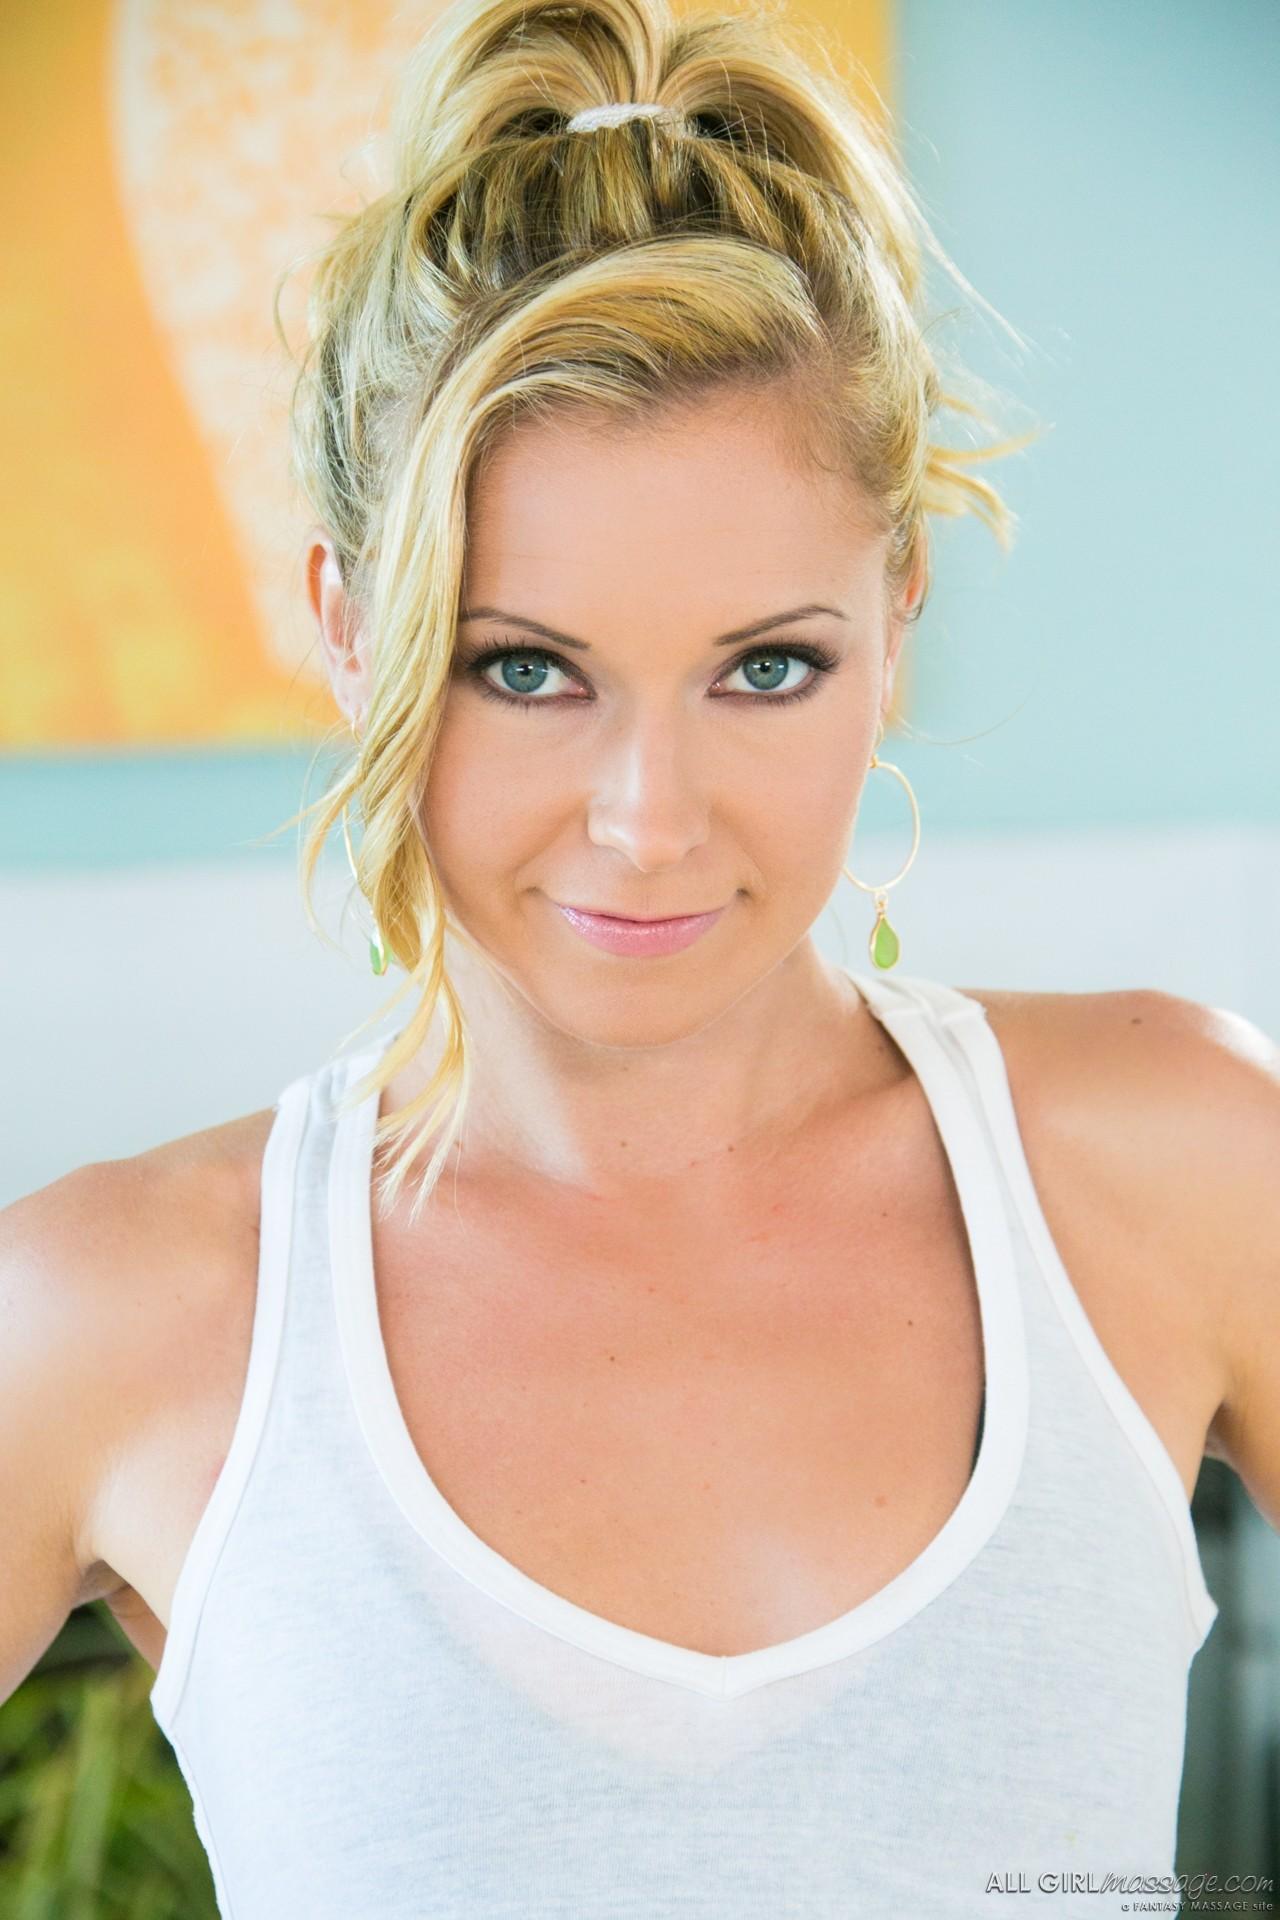 Lena Nicole, Lexi Belle - Health Club 68654